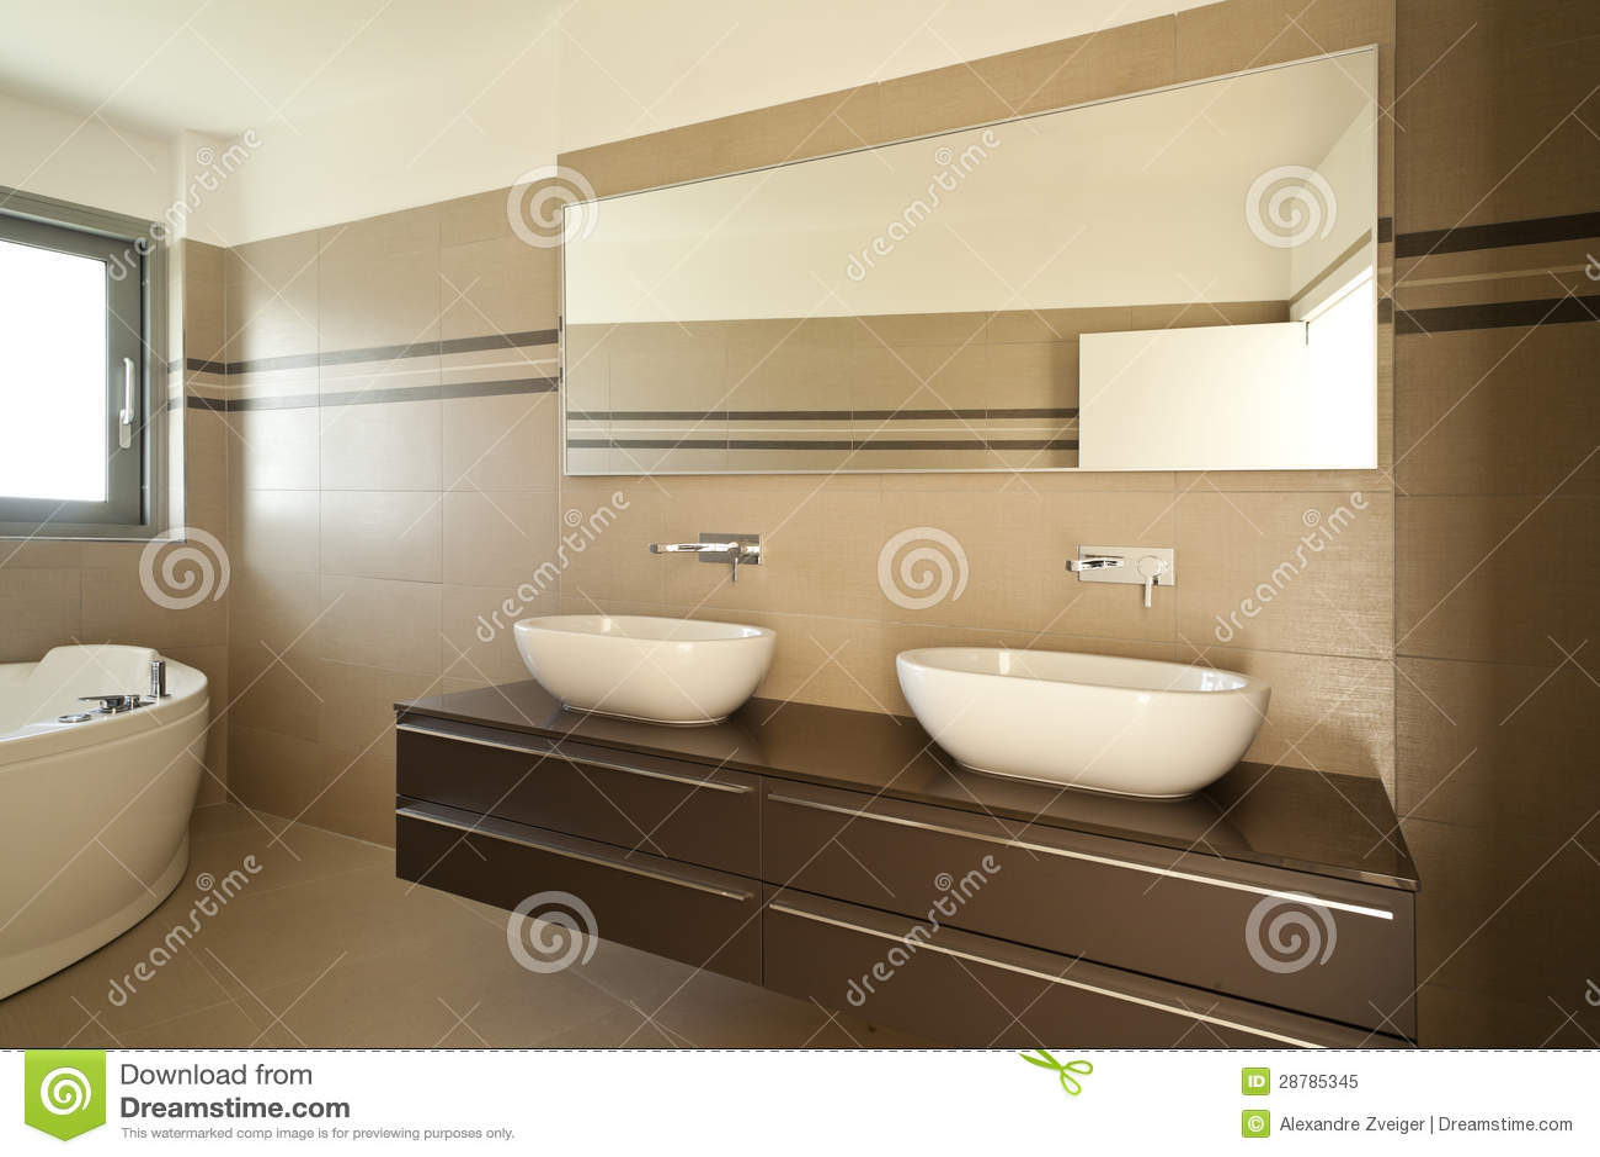 modernes badezimmer lizenzfreies stockfoto - bild: 28785345, Badezimmer ideen